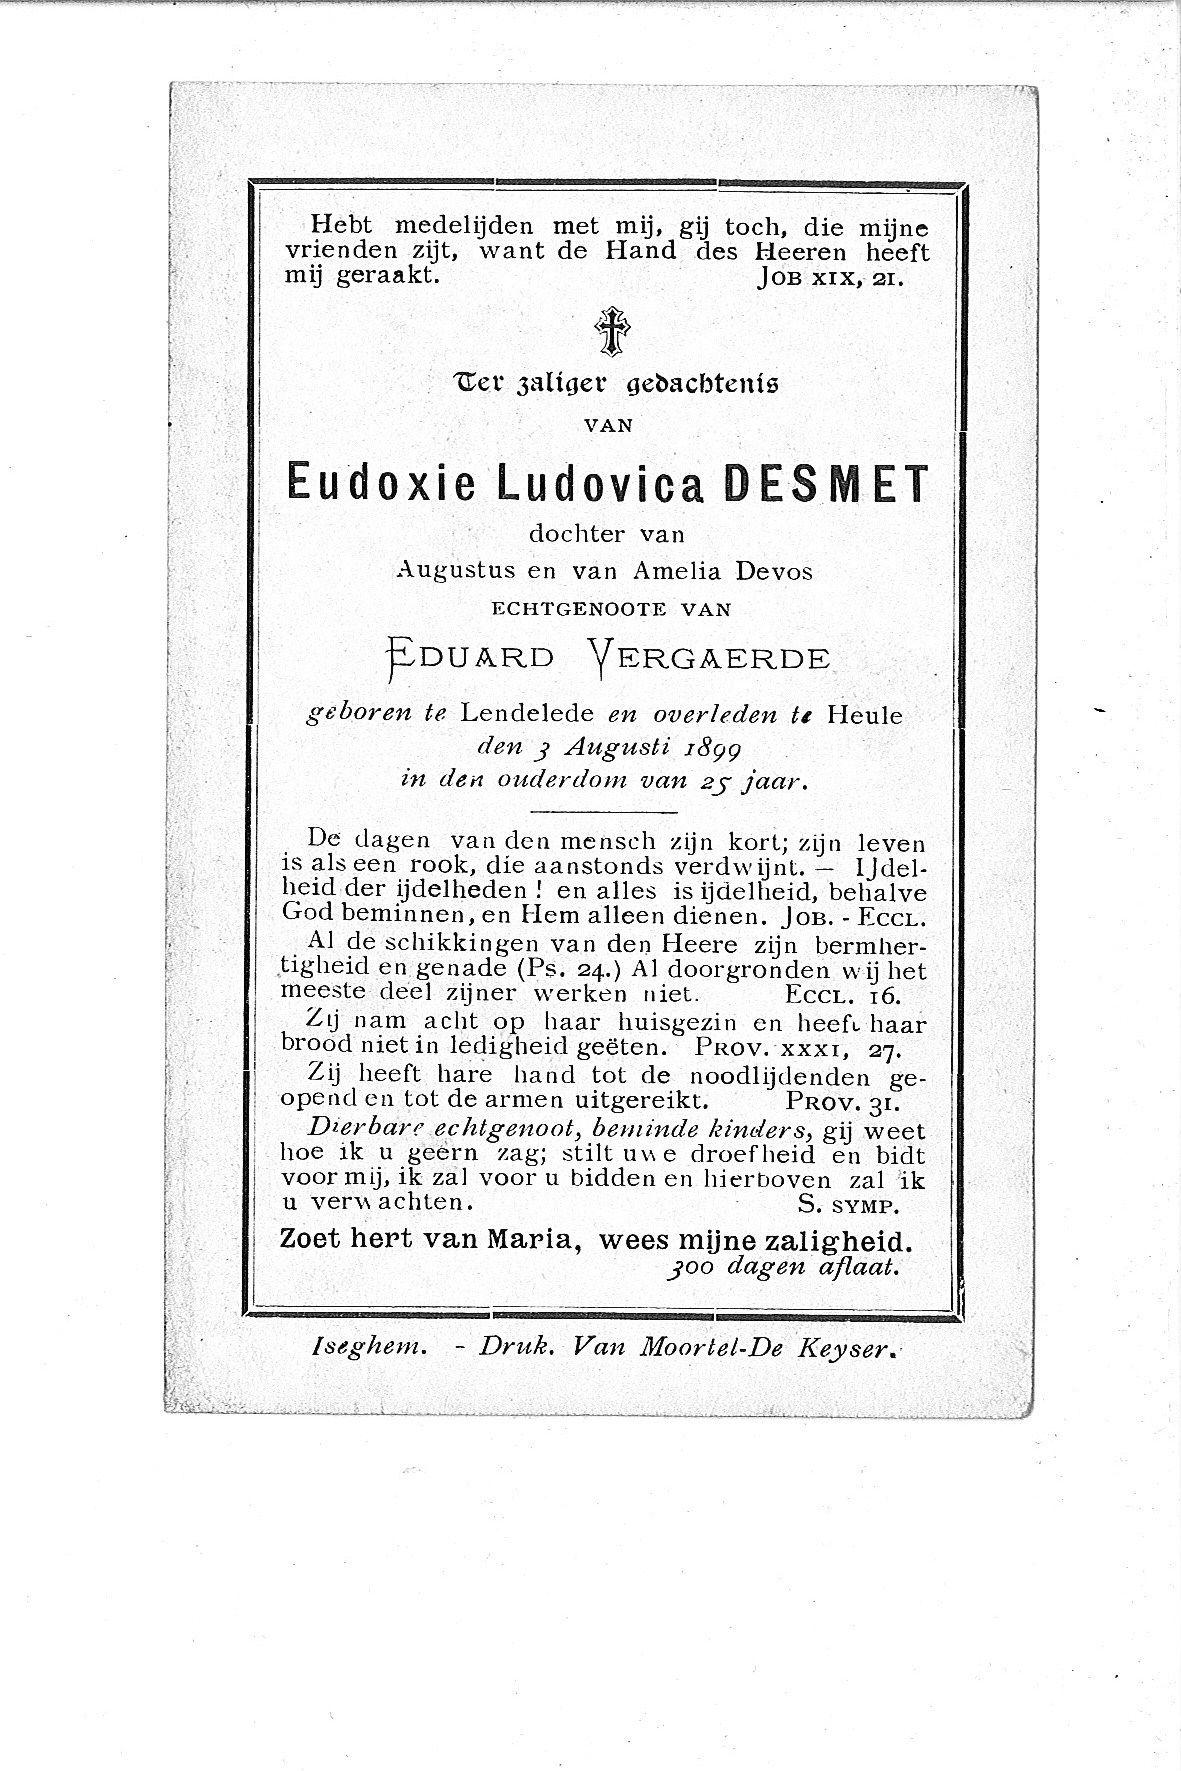 Eudoxie Ludovica (1899) 20091016134529_00030.jpg